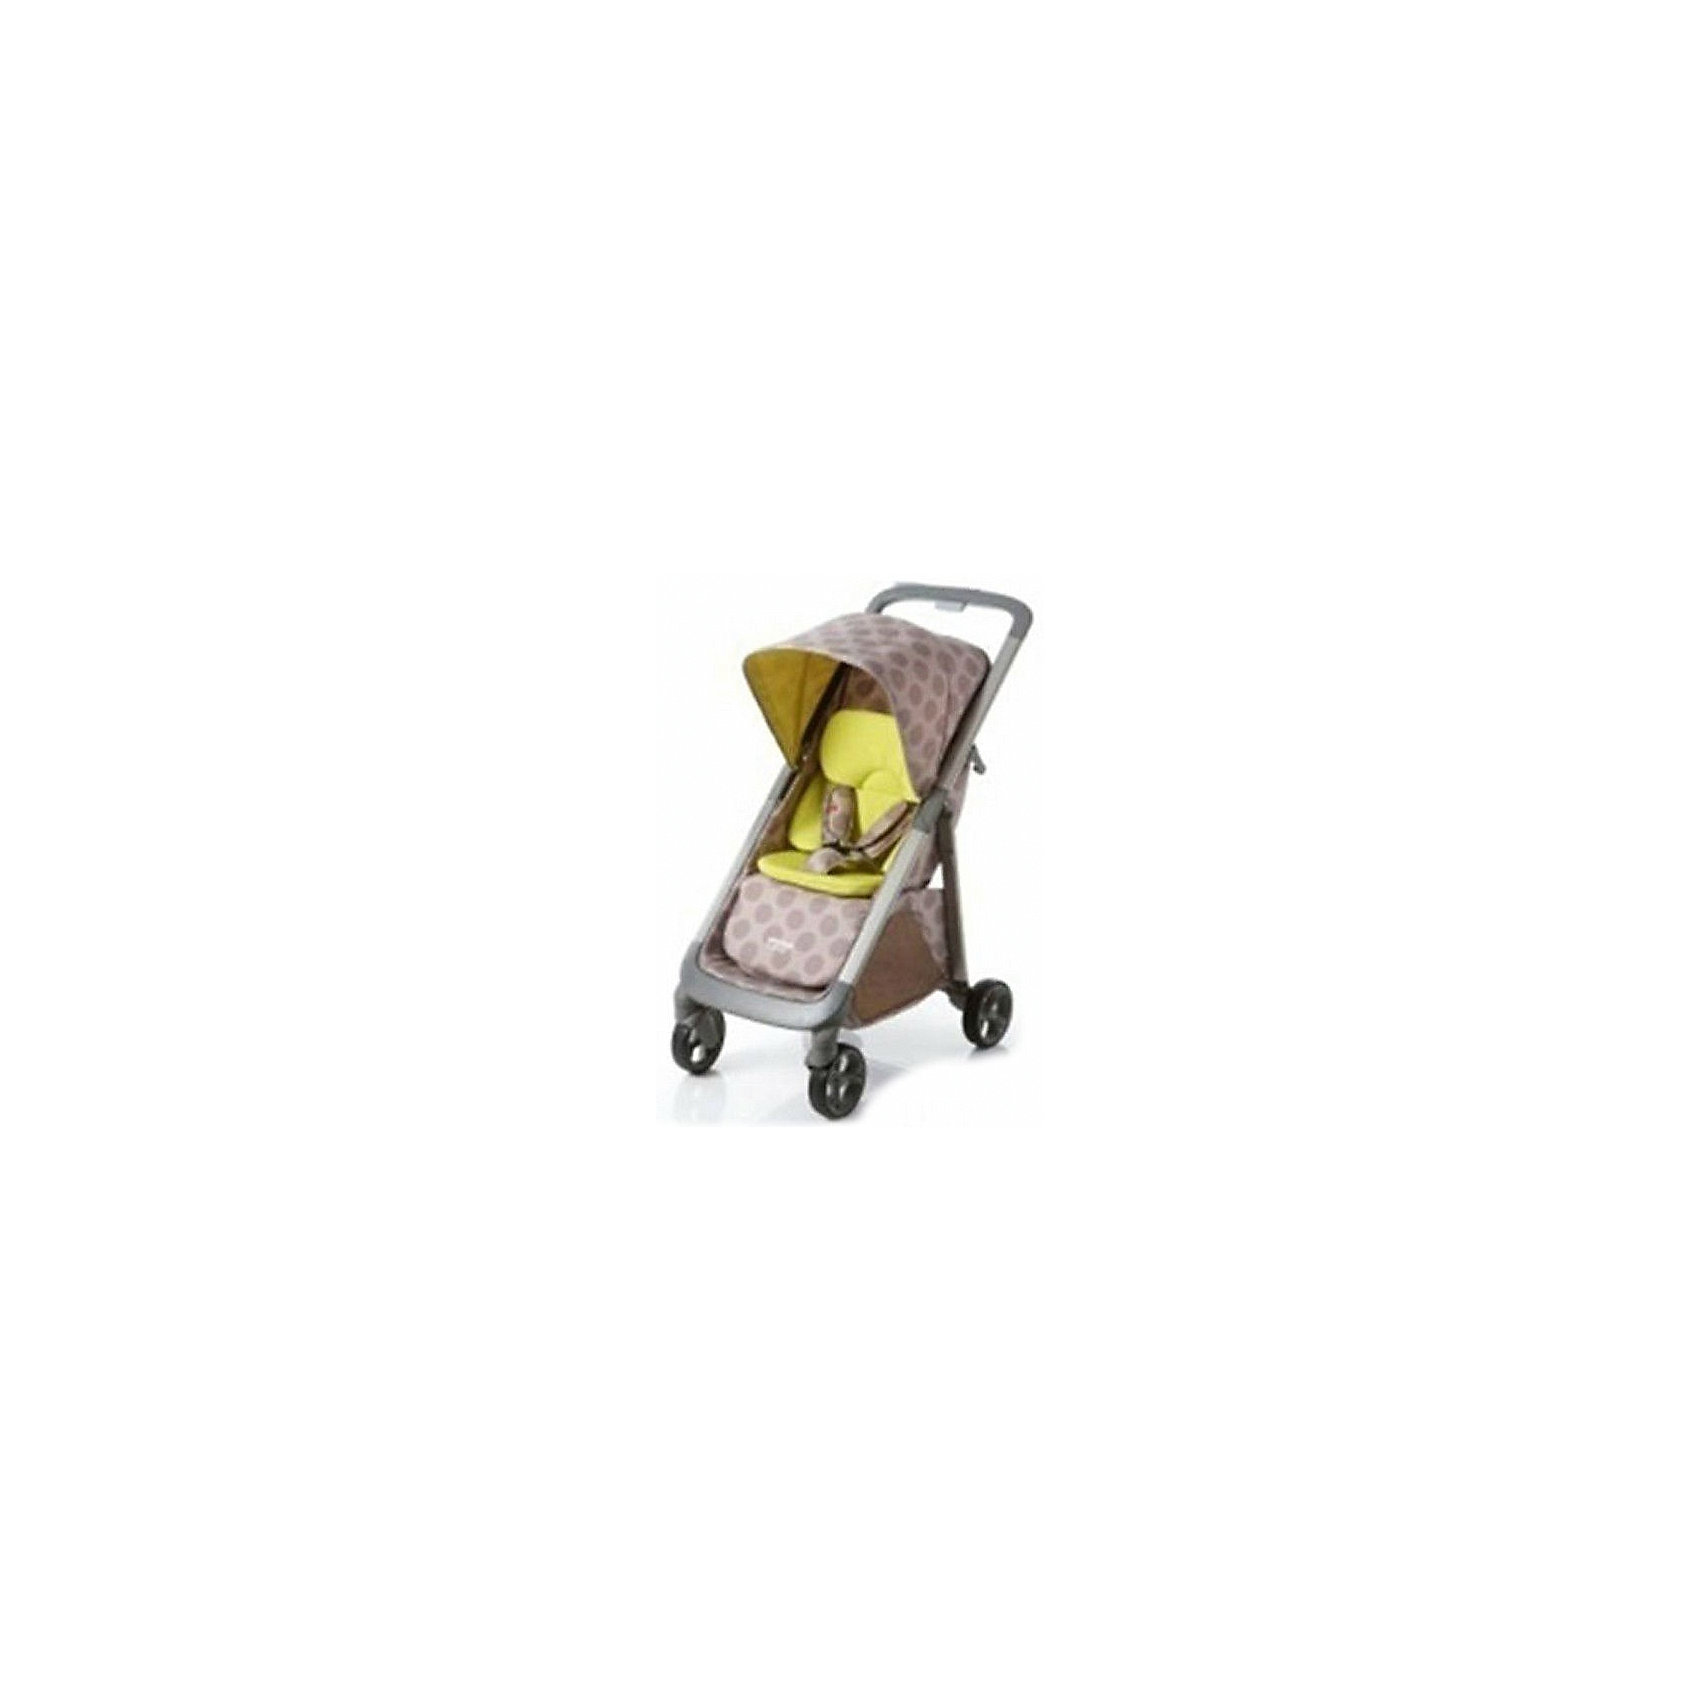 Прогулочная коляска Geoby C1020, бежевый/лимонный